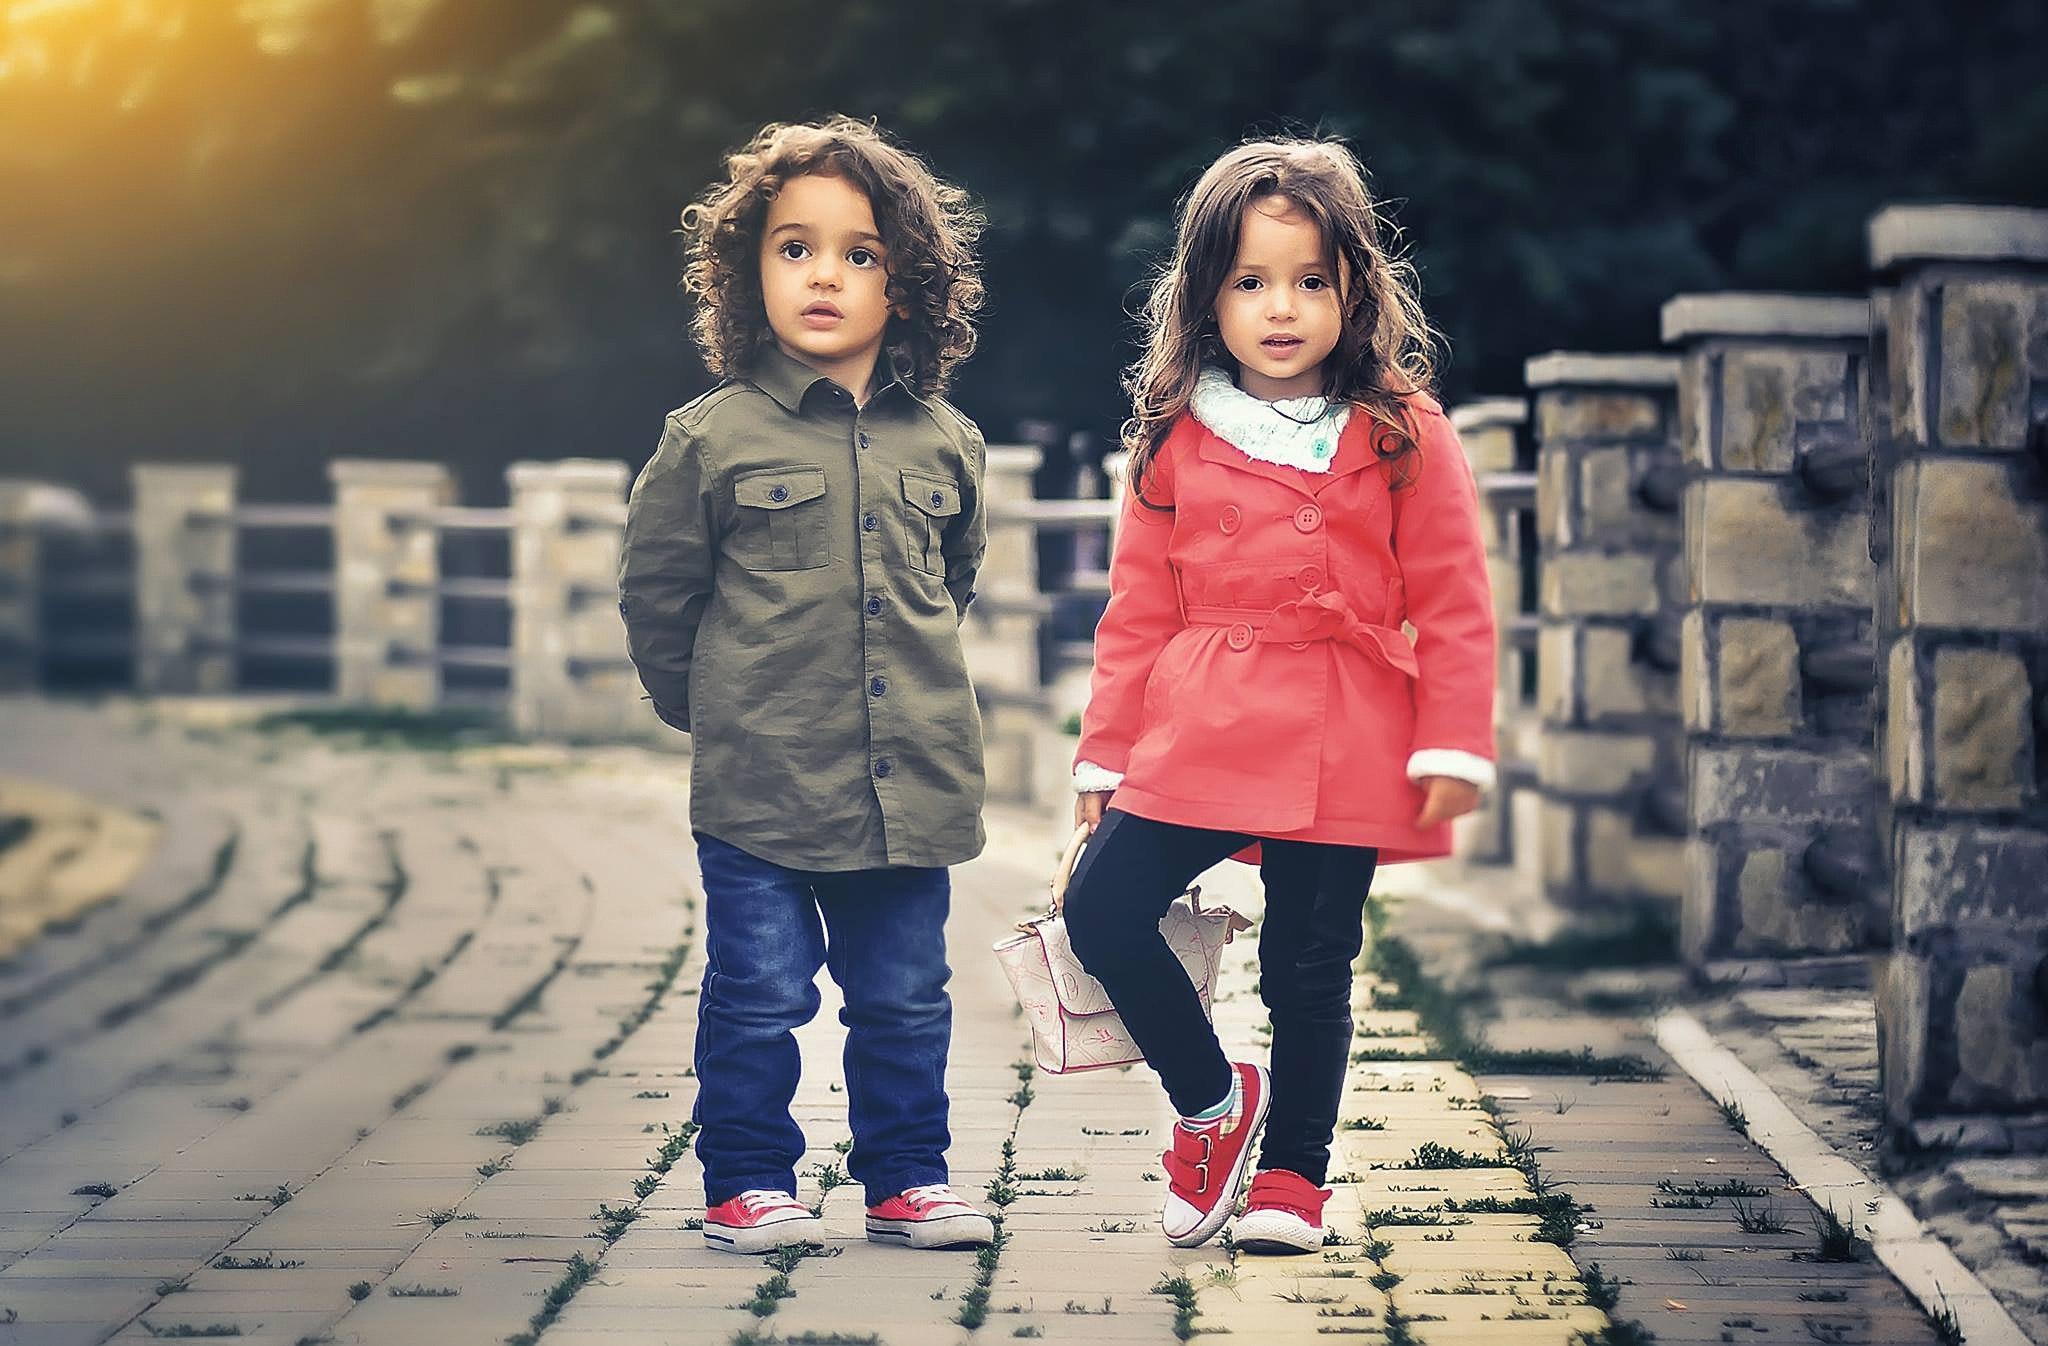 1000+ Amazing Kids Photos · Pexels · Free Stock Photos